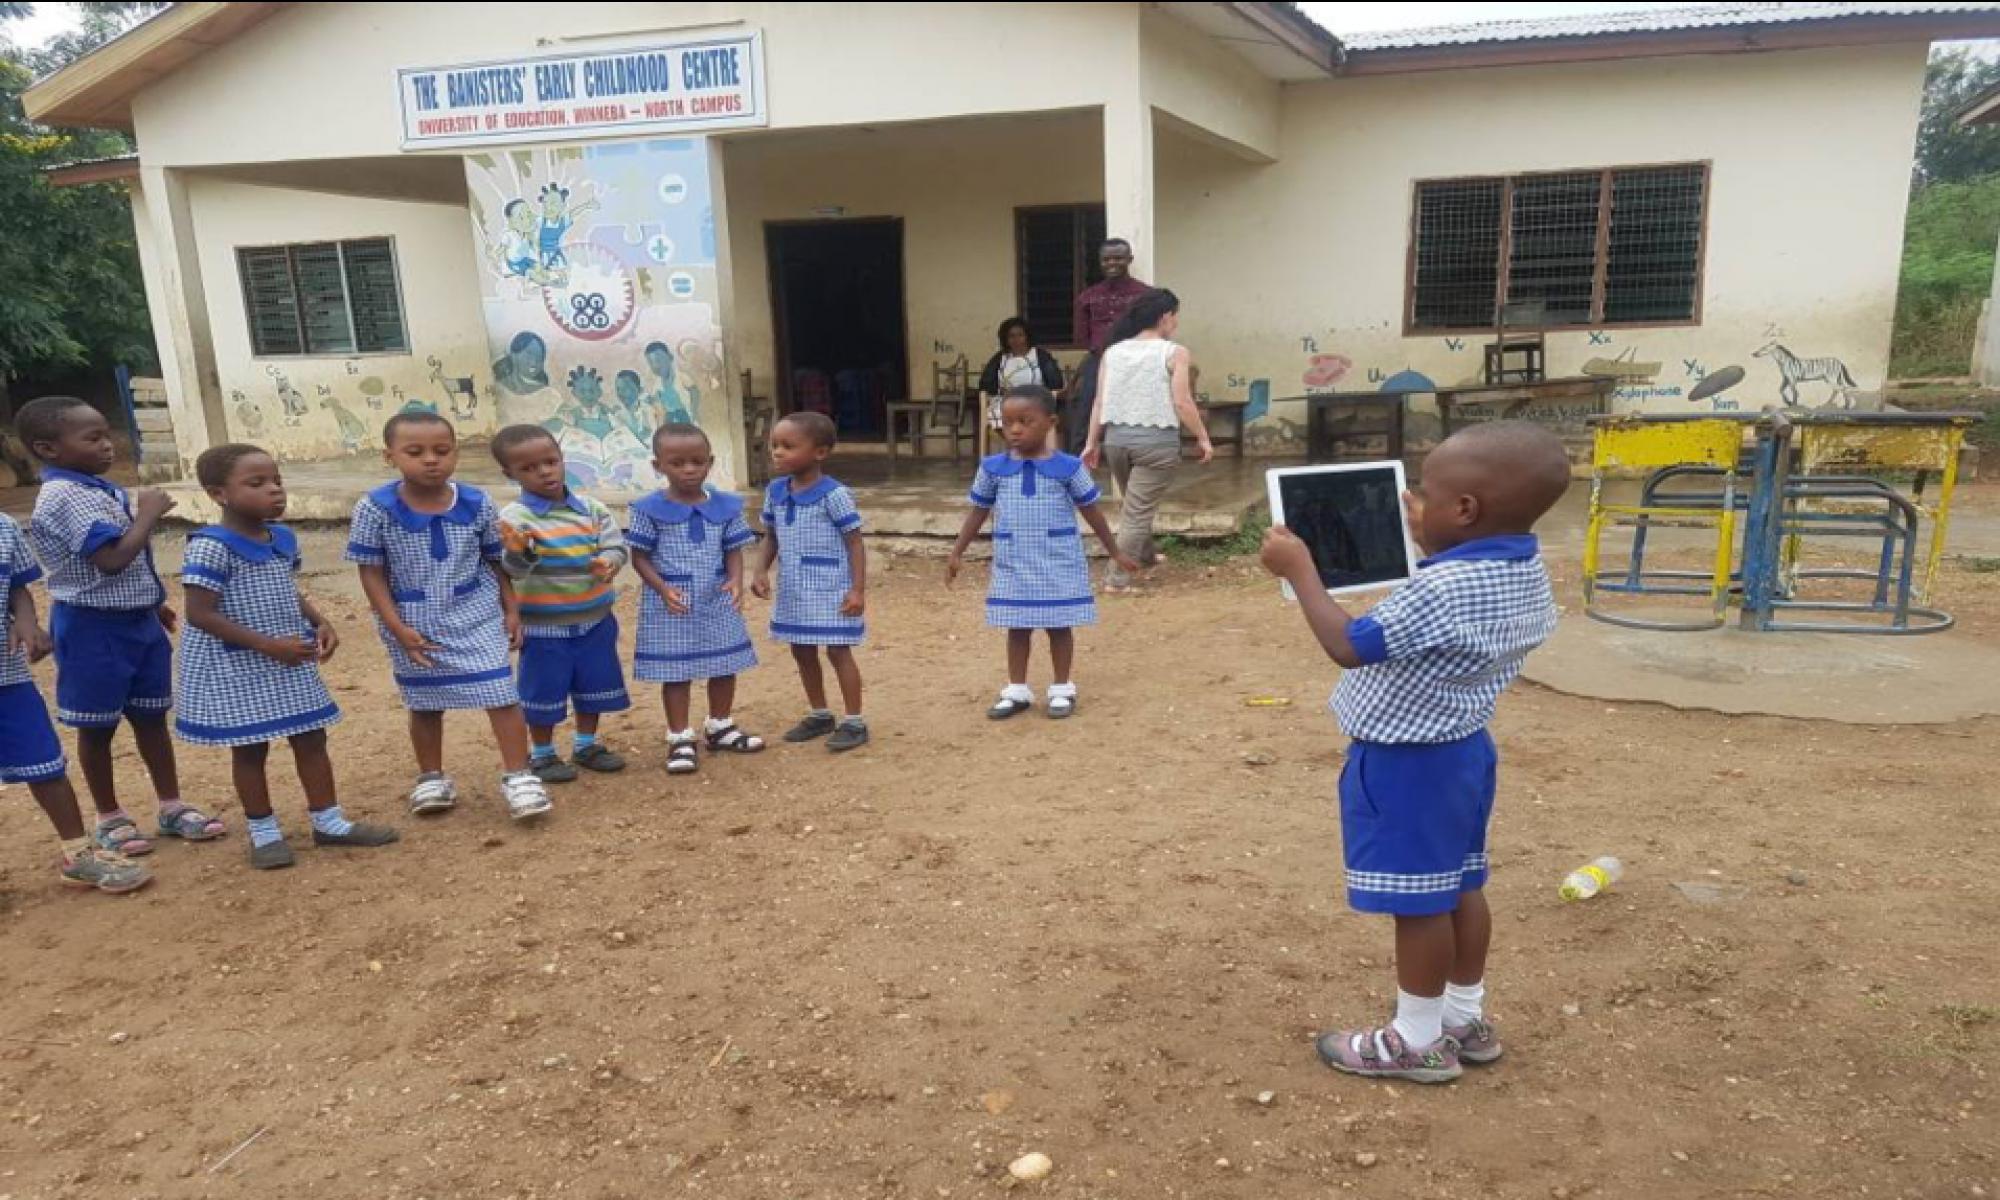 Globale kindergartens